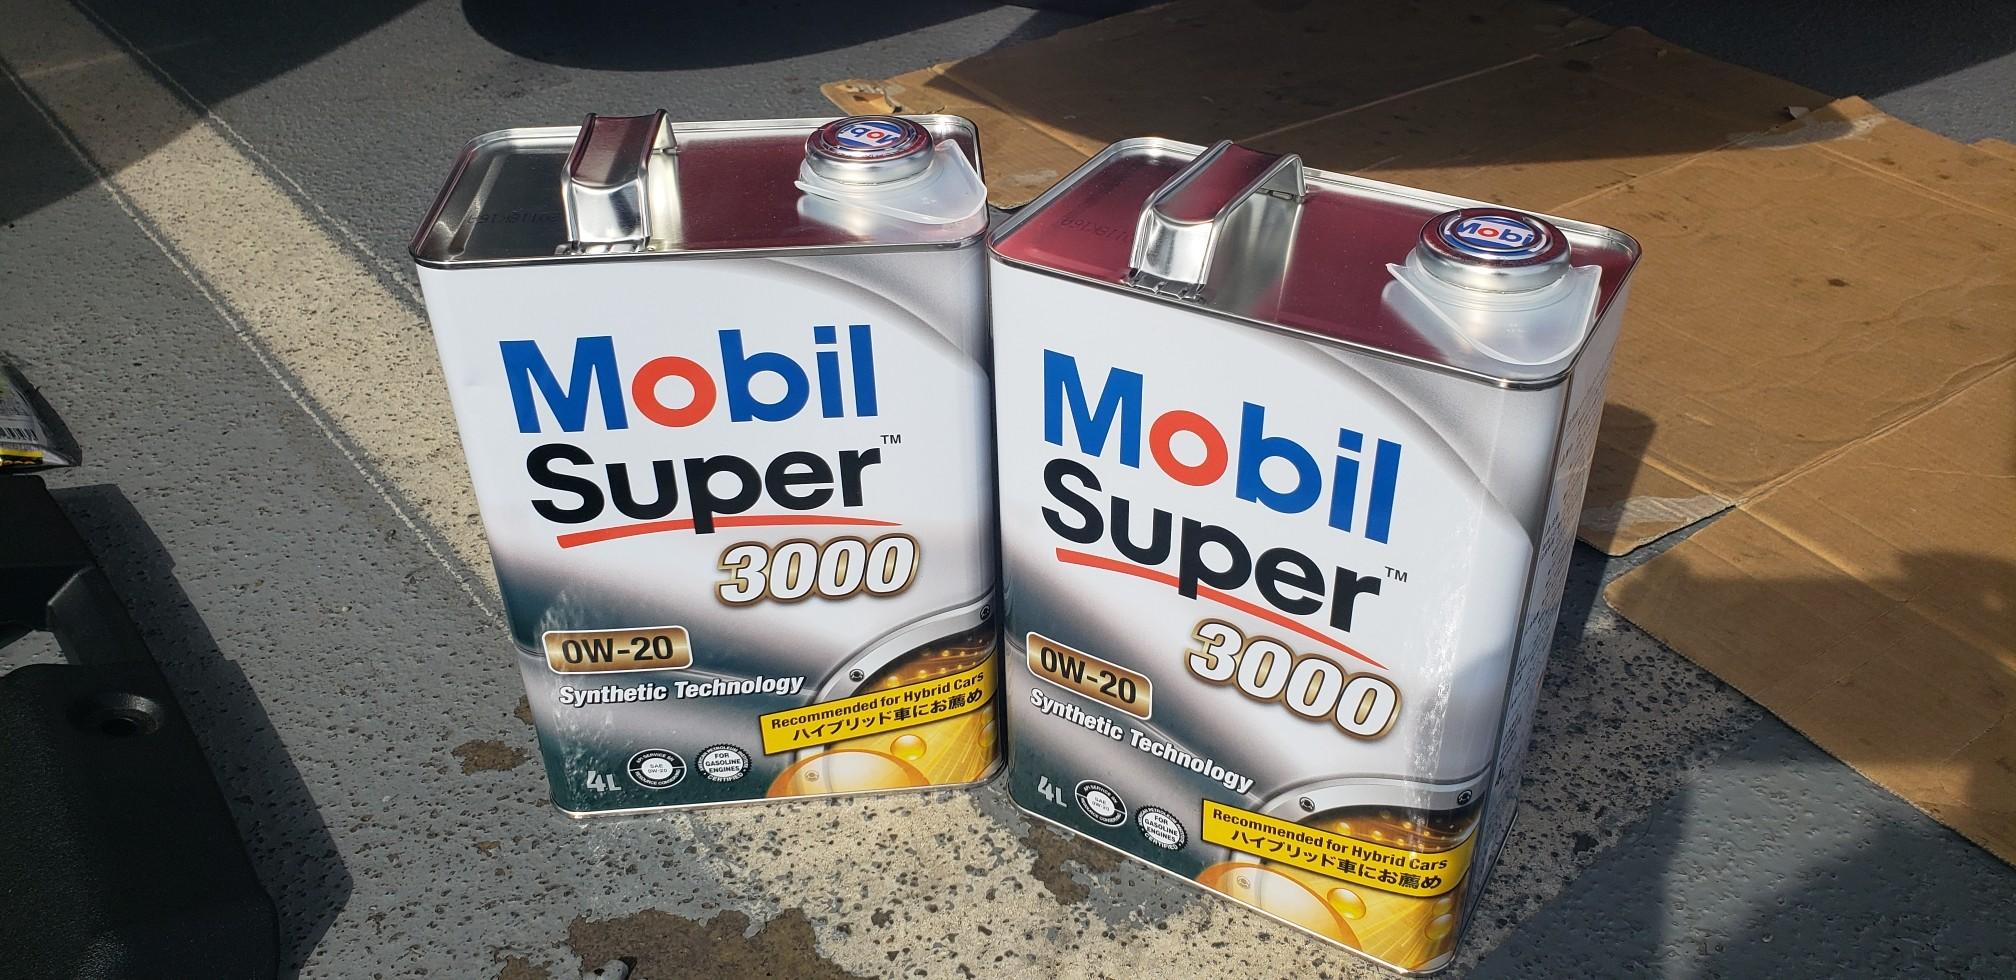 Mobil Mobil Super 3000 0W-20